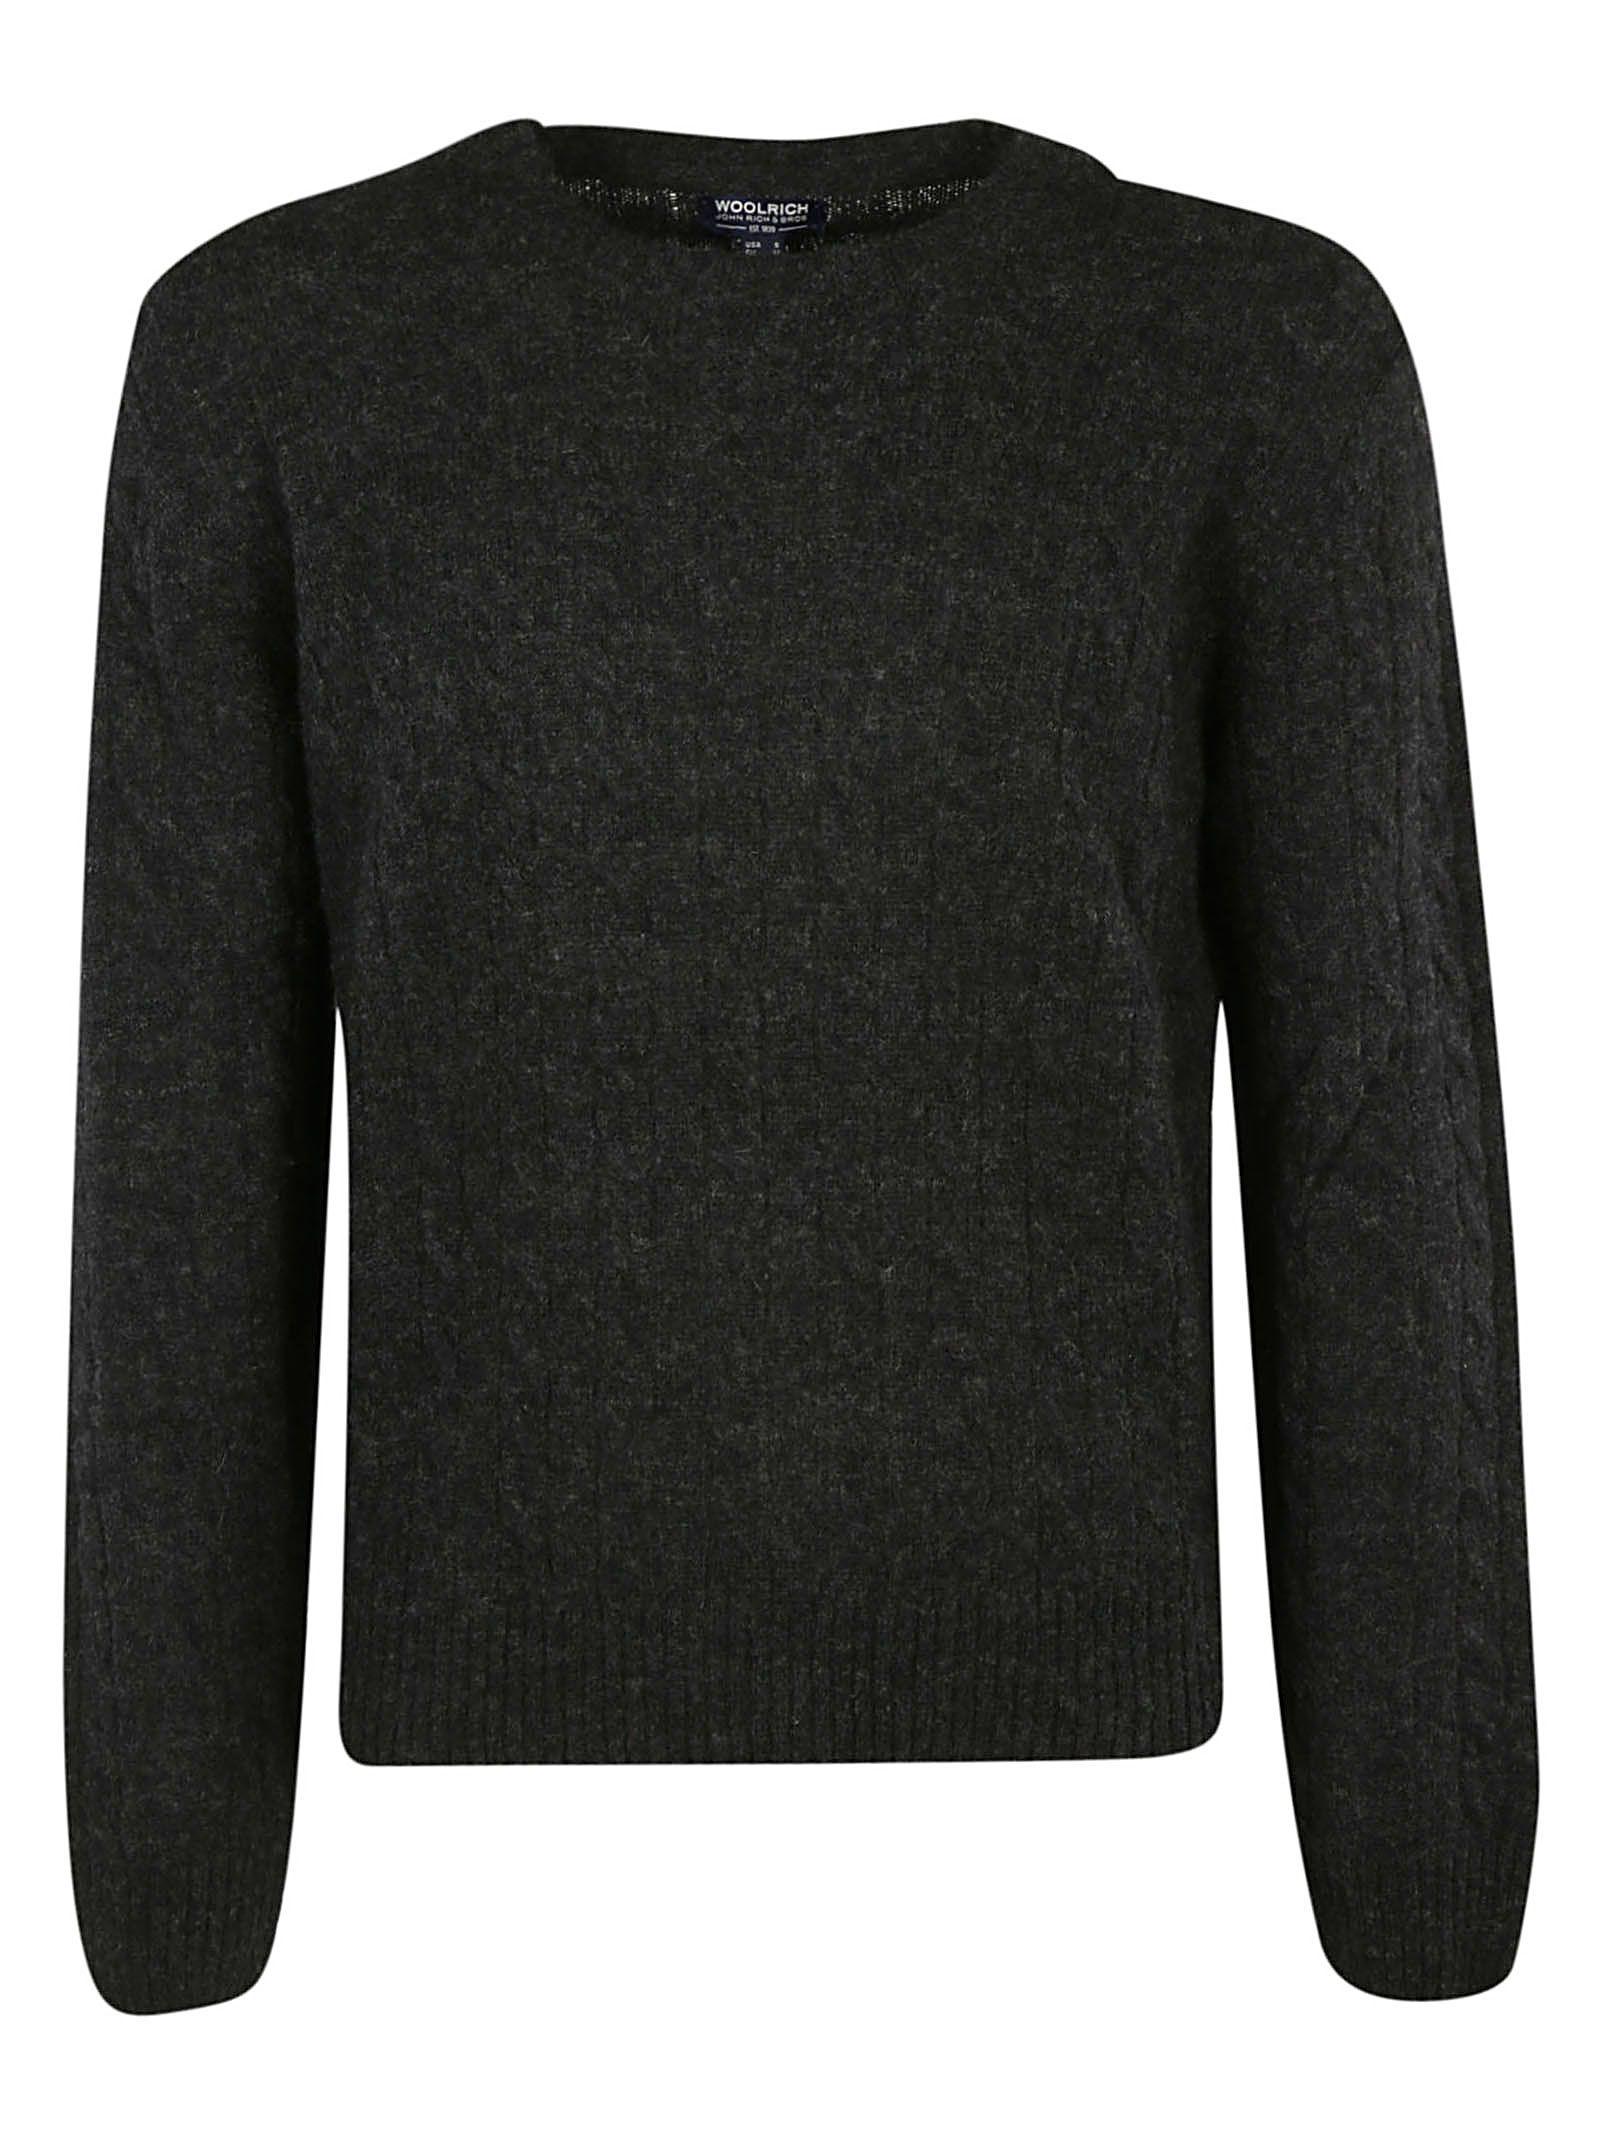 Woolrich Pullover Fine Knit Sweater